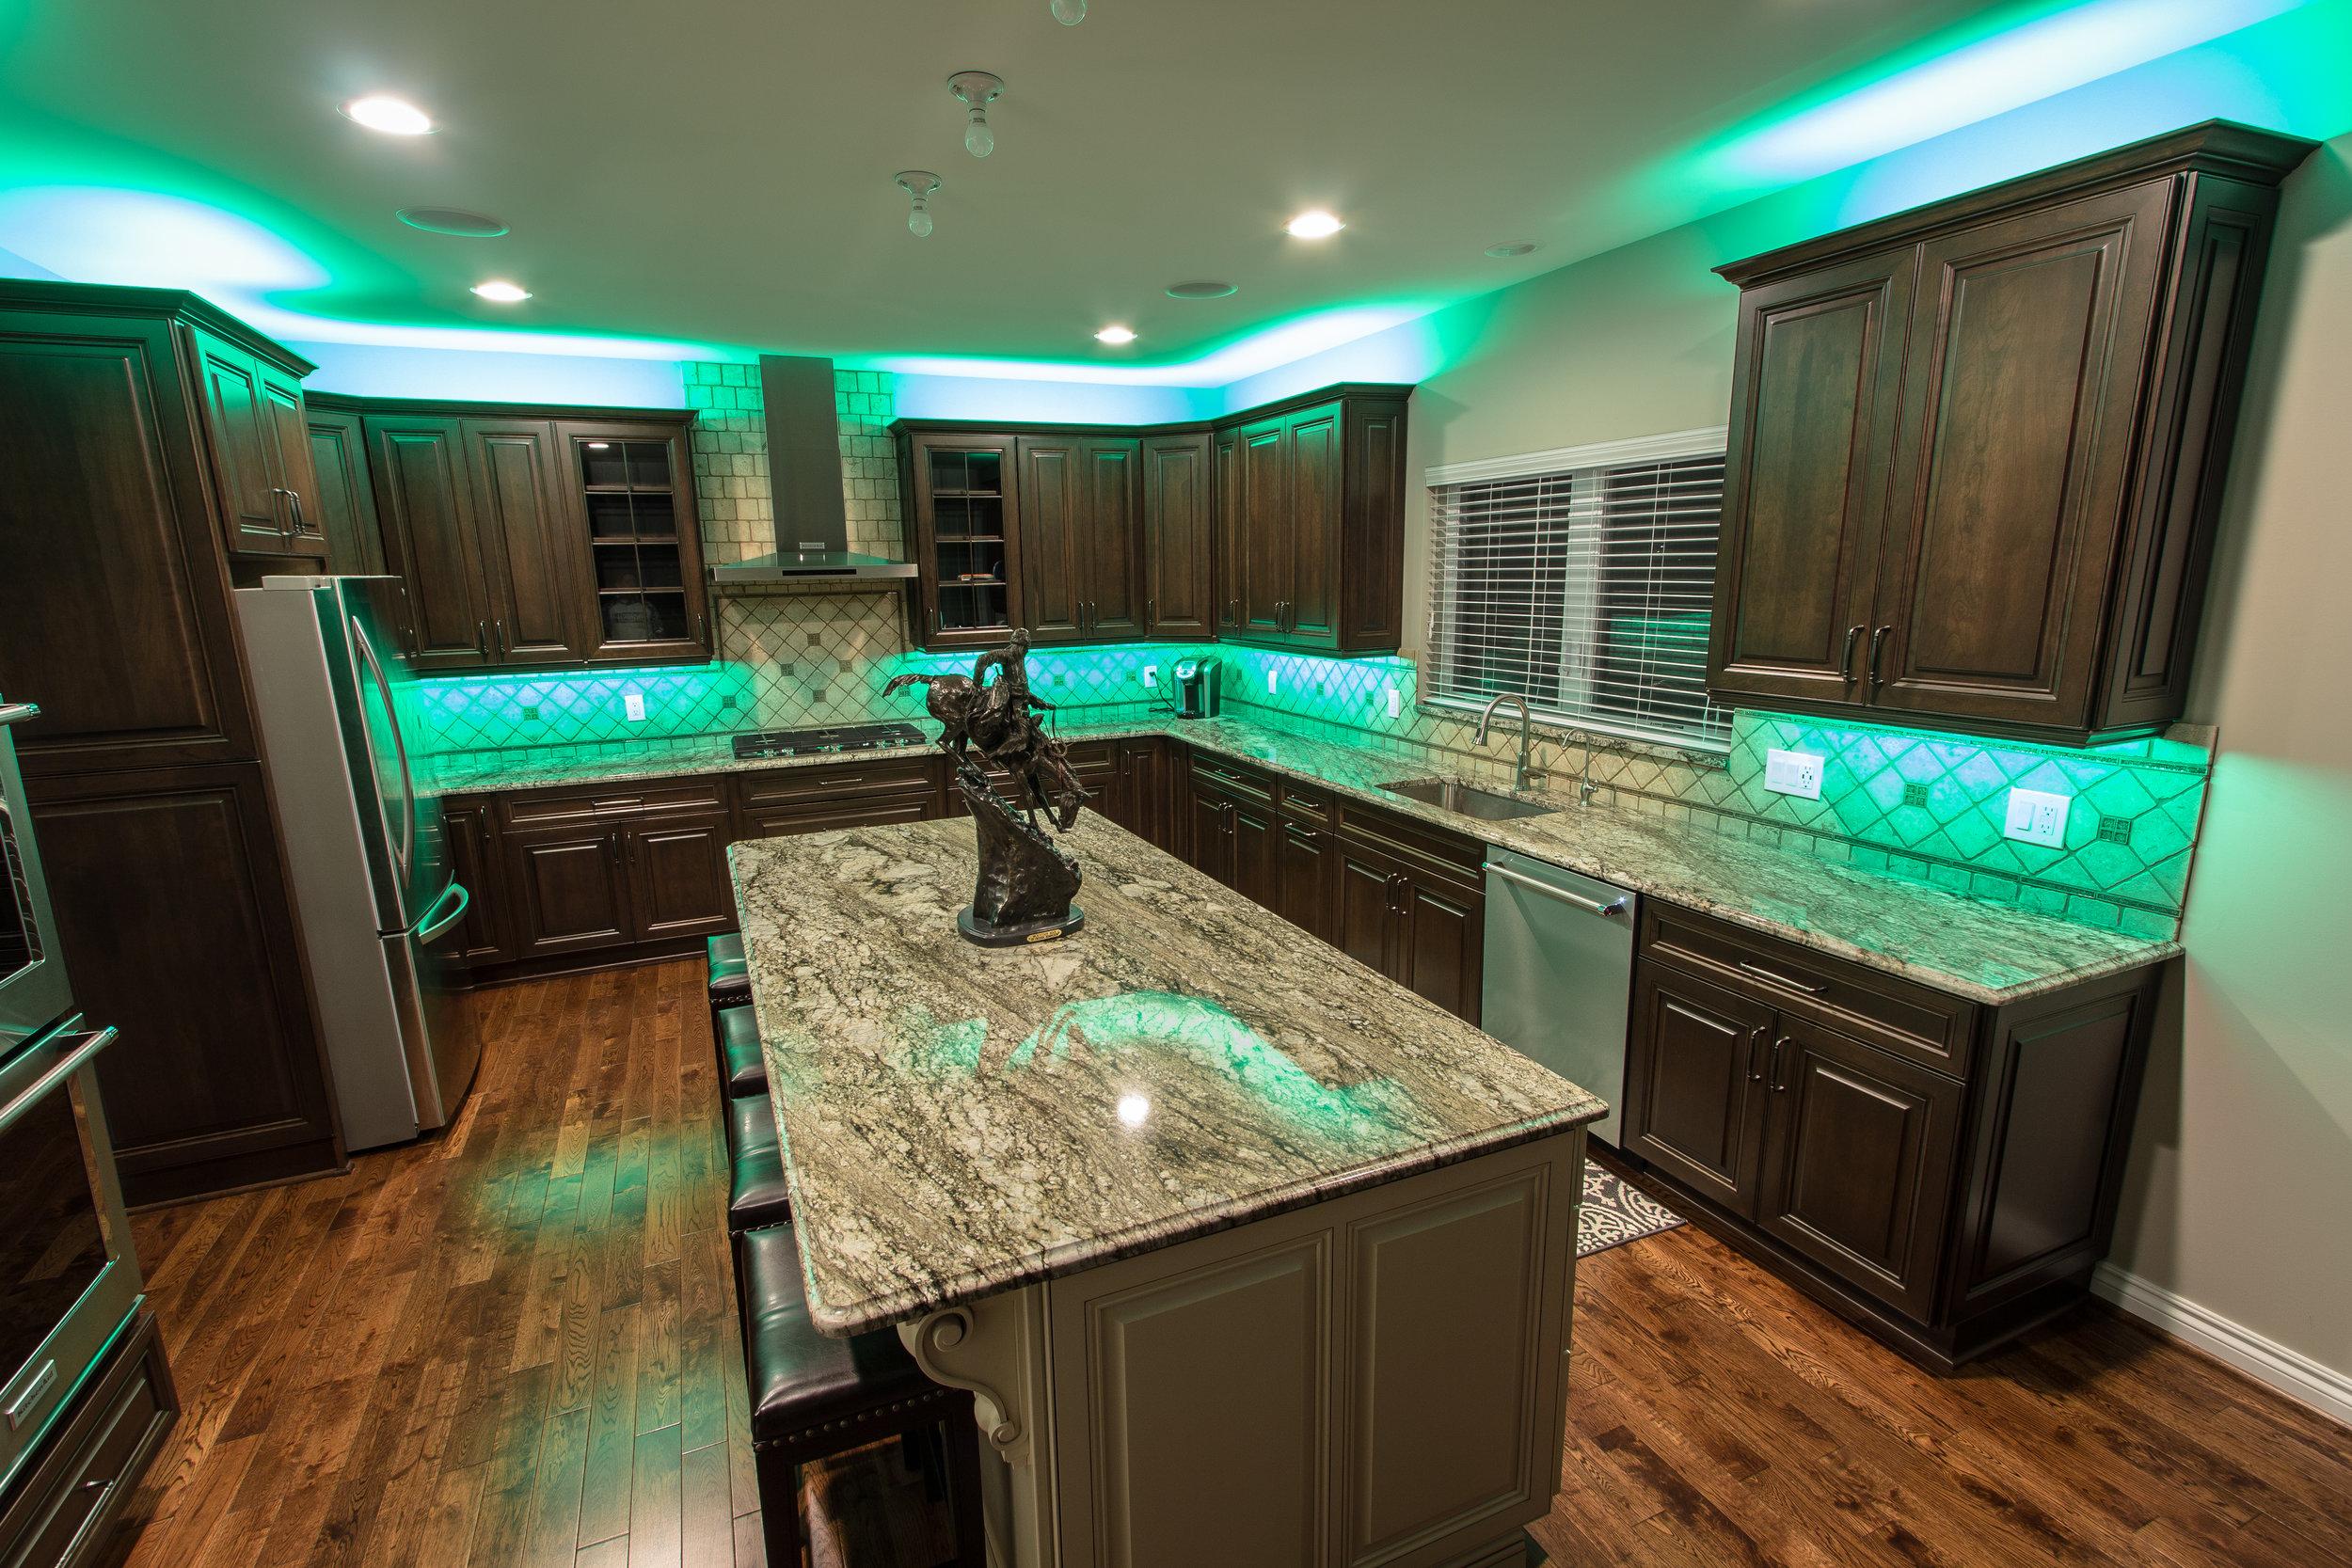 Cabinet Lighting